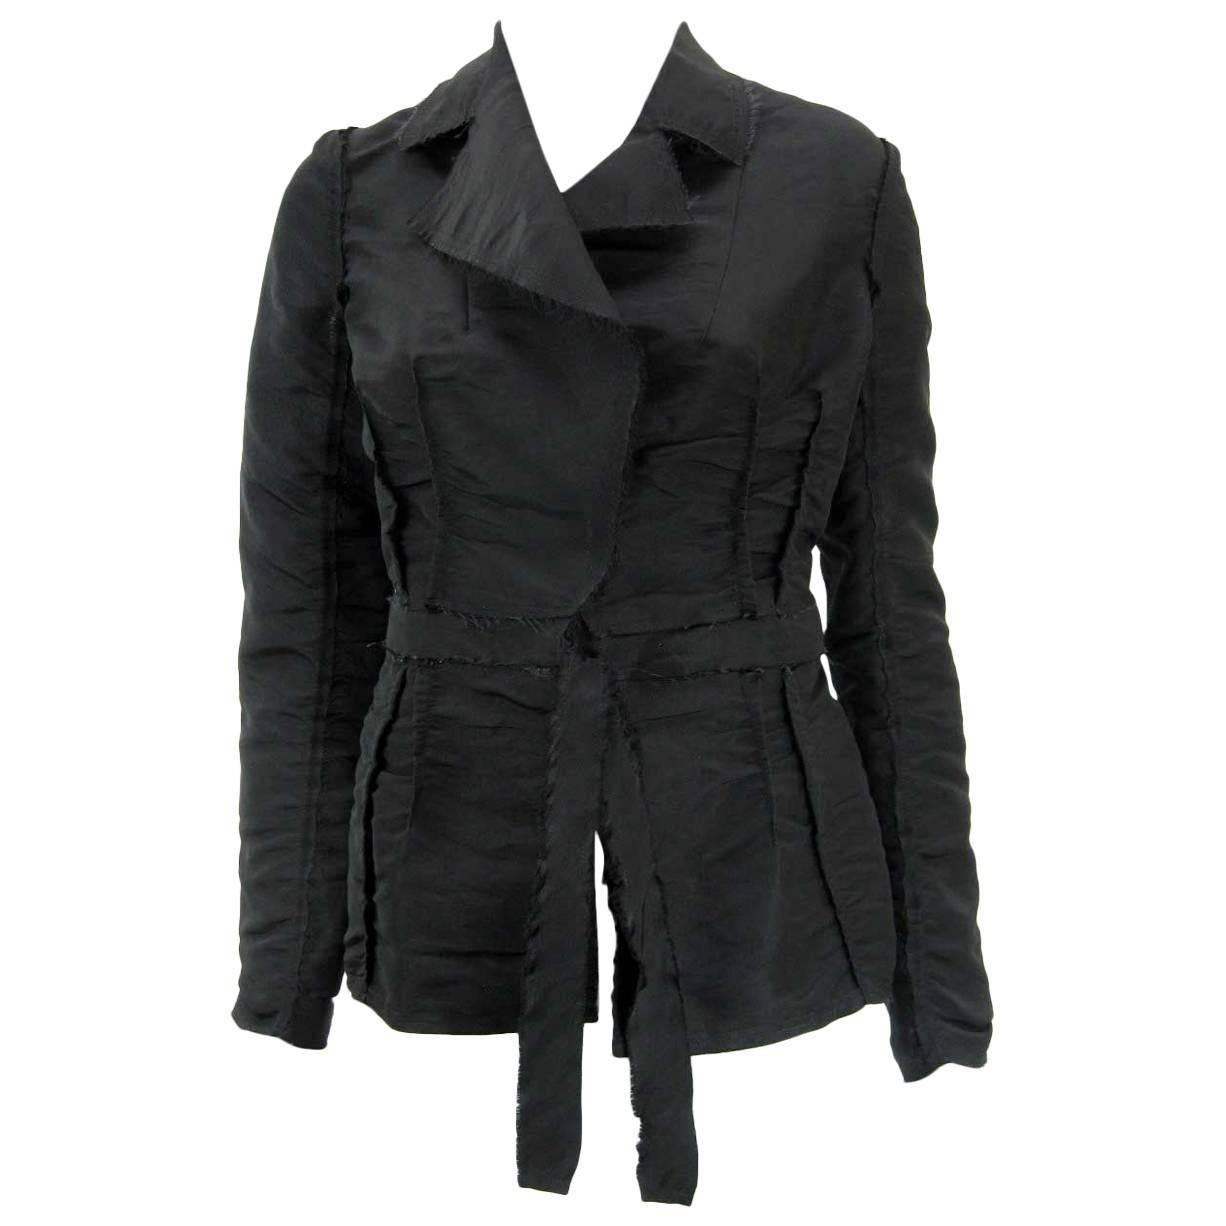 Lanvin 2005 Textured Taffeta Frayed Silk Wrap Jacket